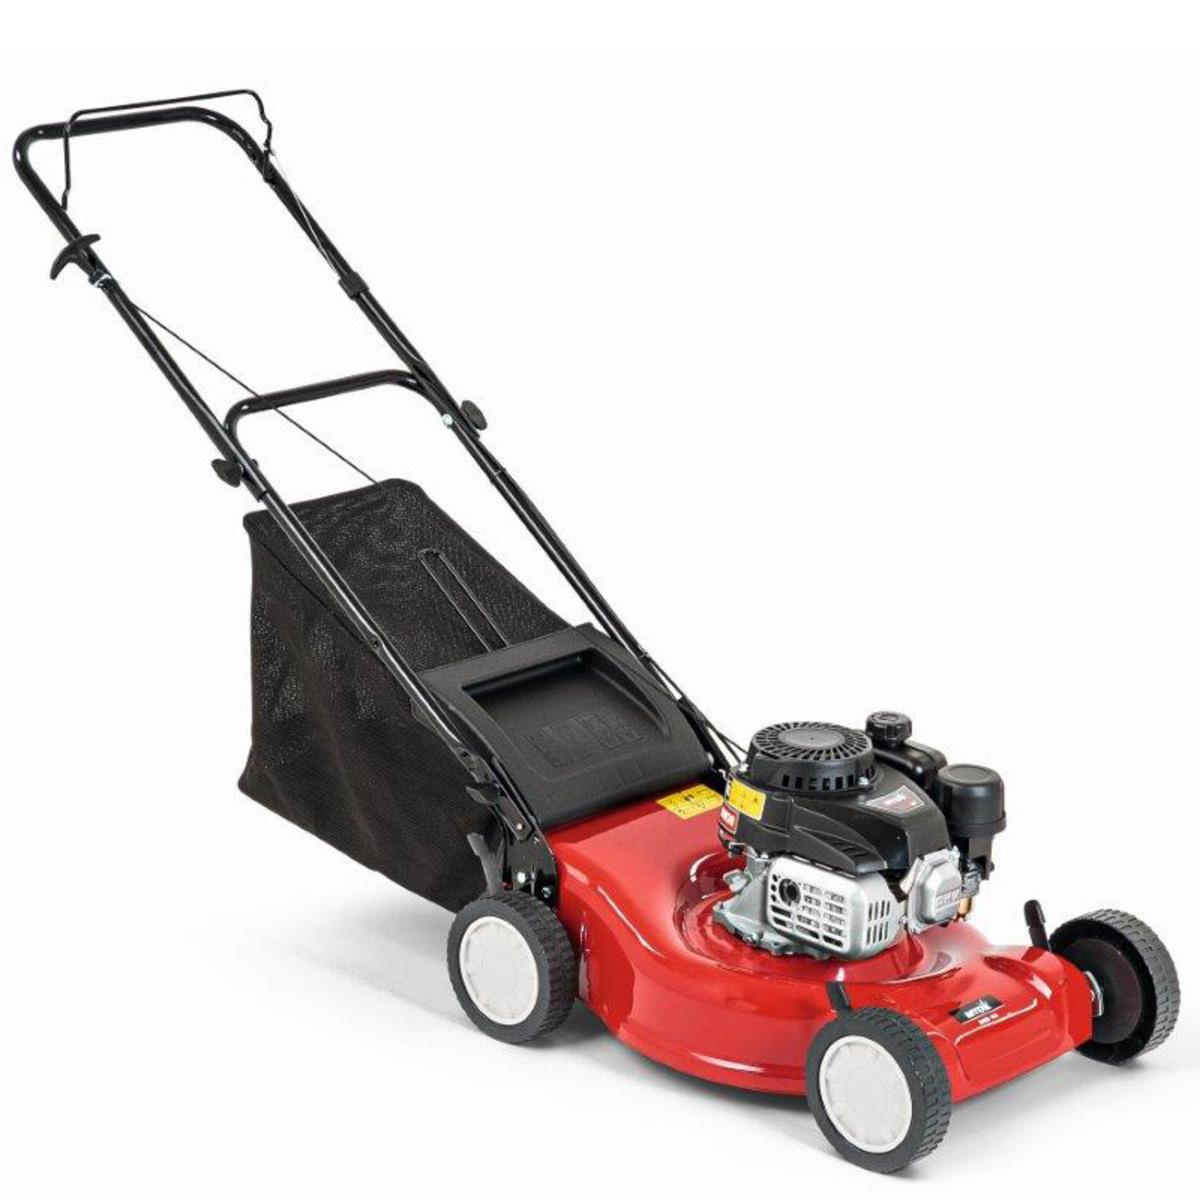 hight resolution of mtd thorx 123cc 18 46cm push propelled petrol lawn mower model mtd46